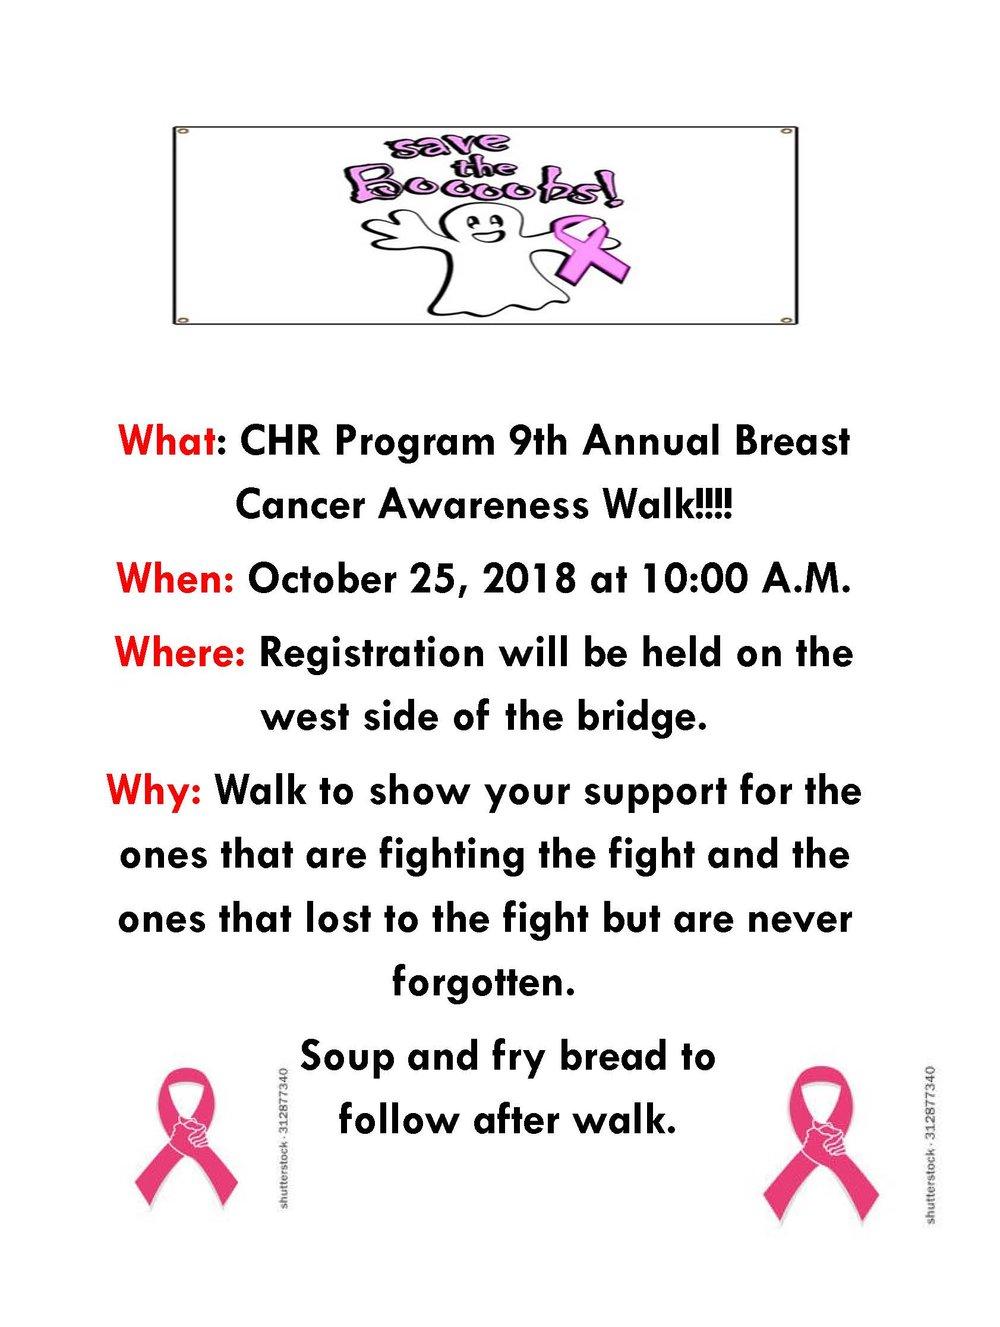 9th Annual Breast Cancer Awareness Walk.jpg